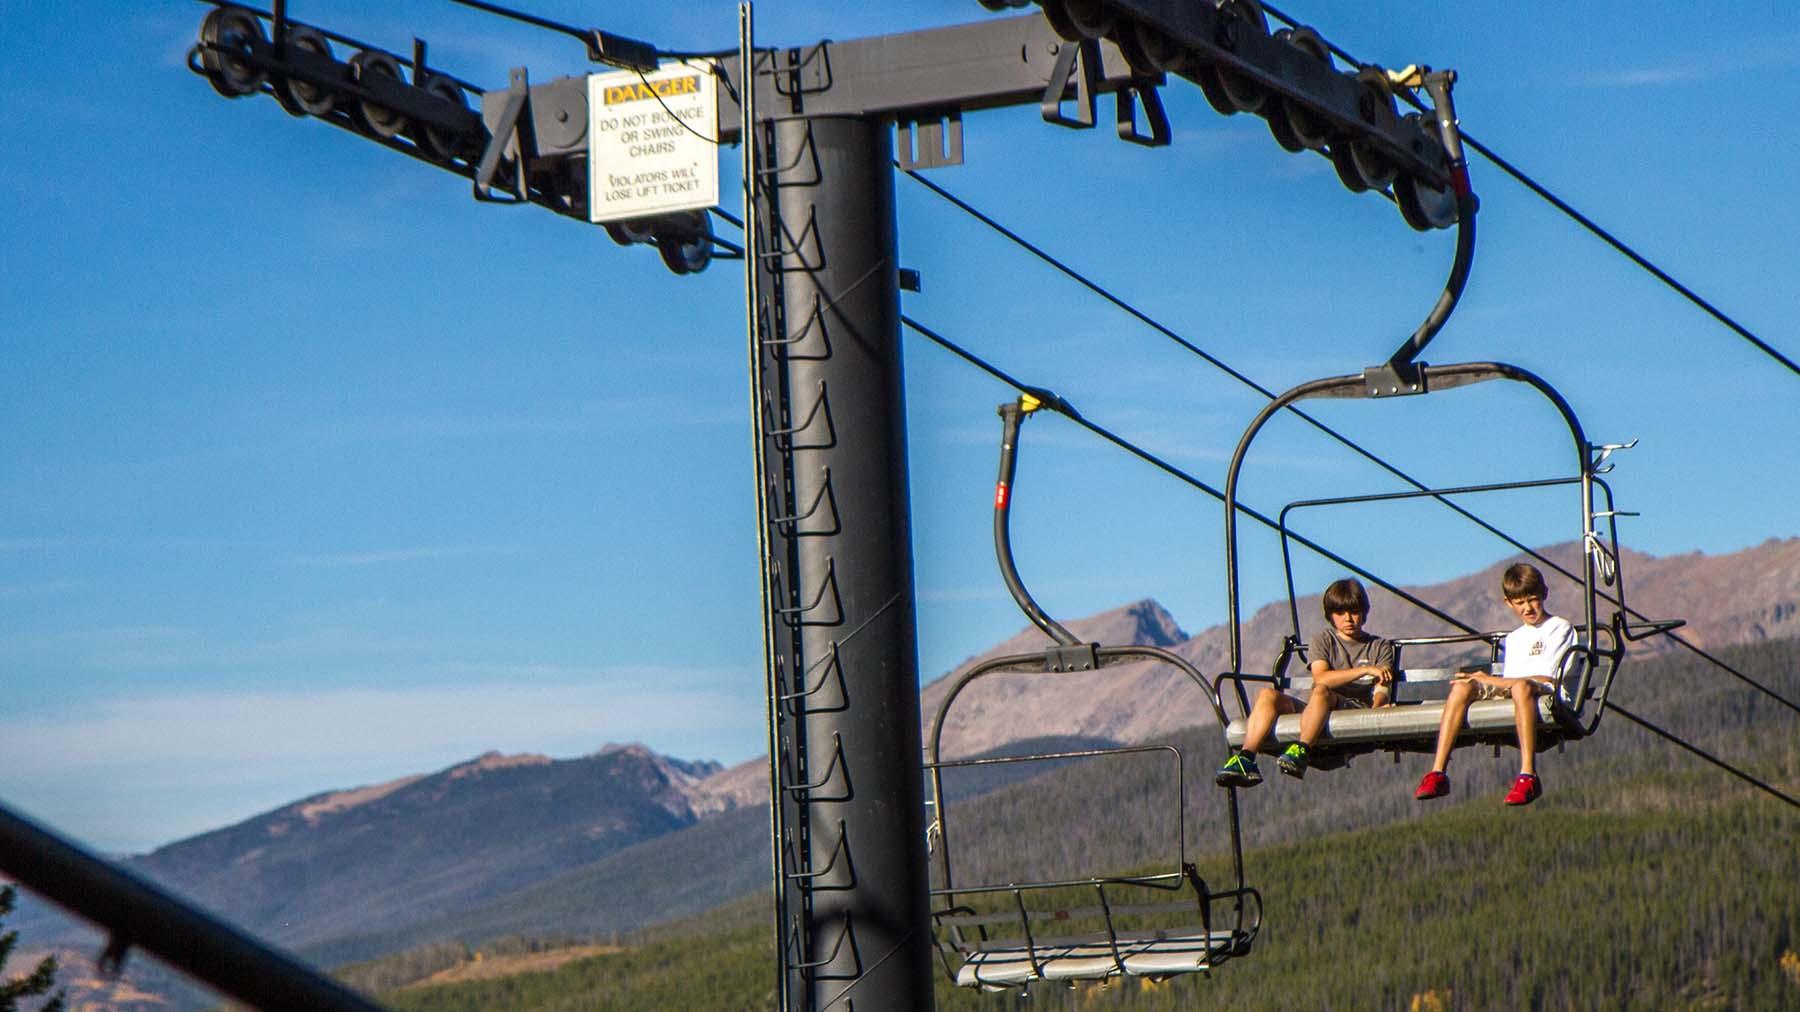 gopro jetsetter chairlift elite lift sunshine village chair town teepee heated